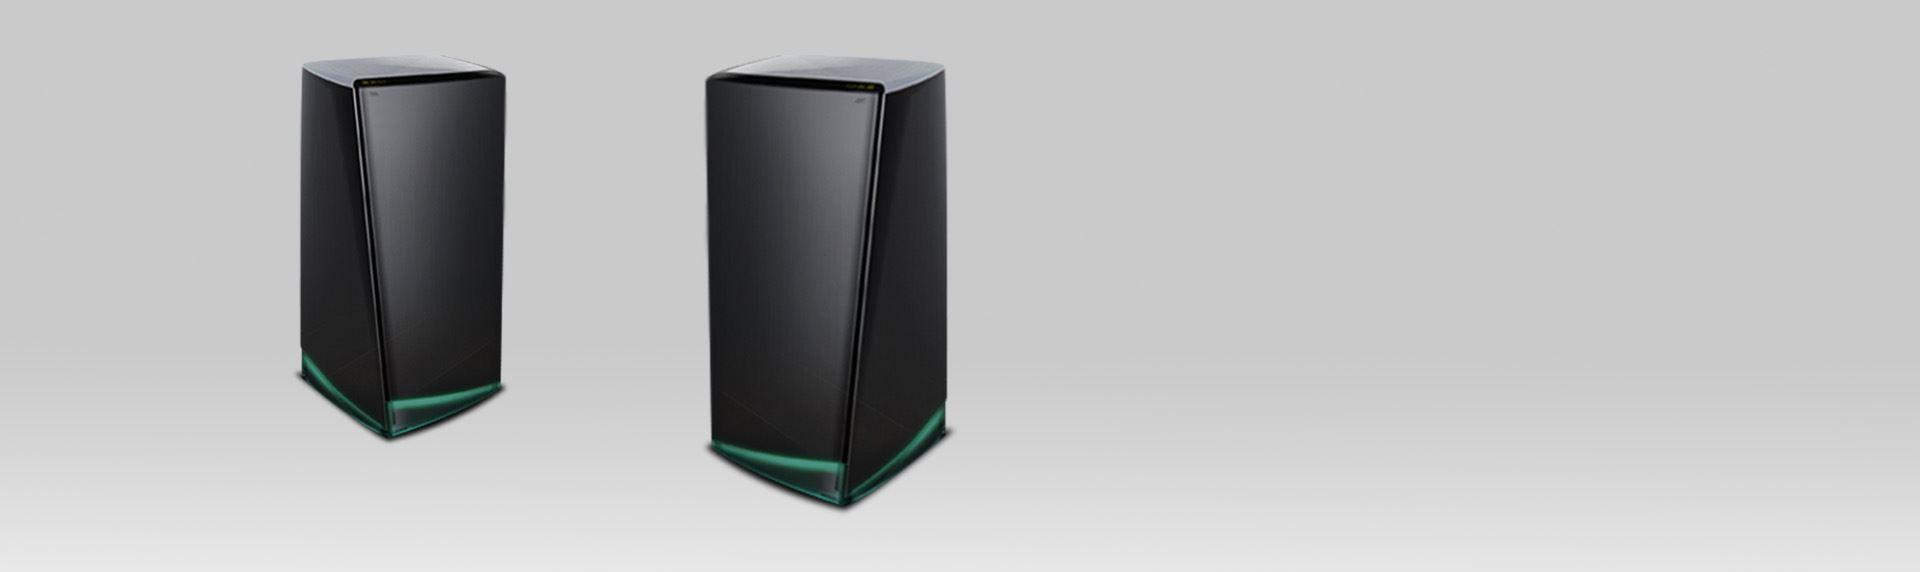 SSC设计-空气净化器